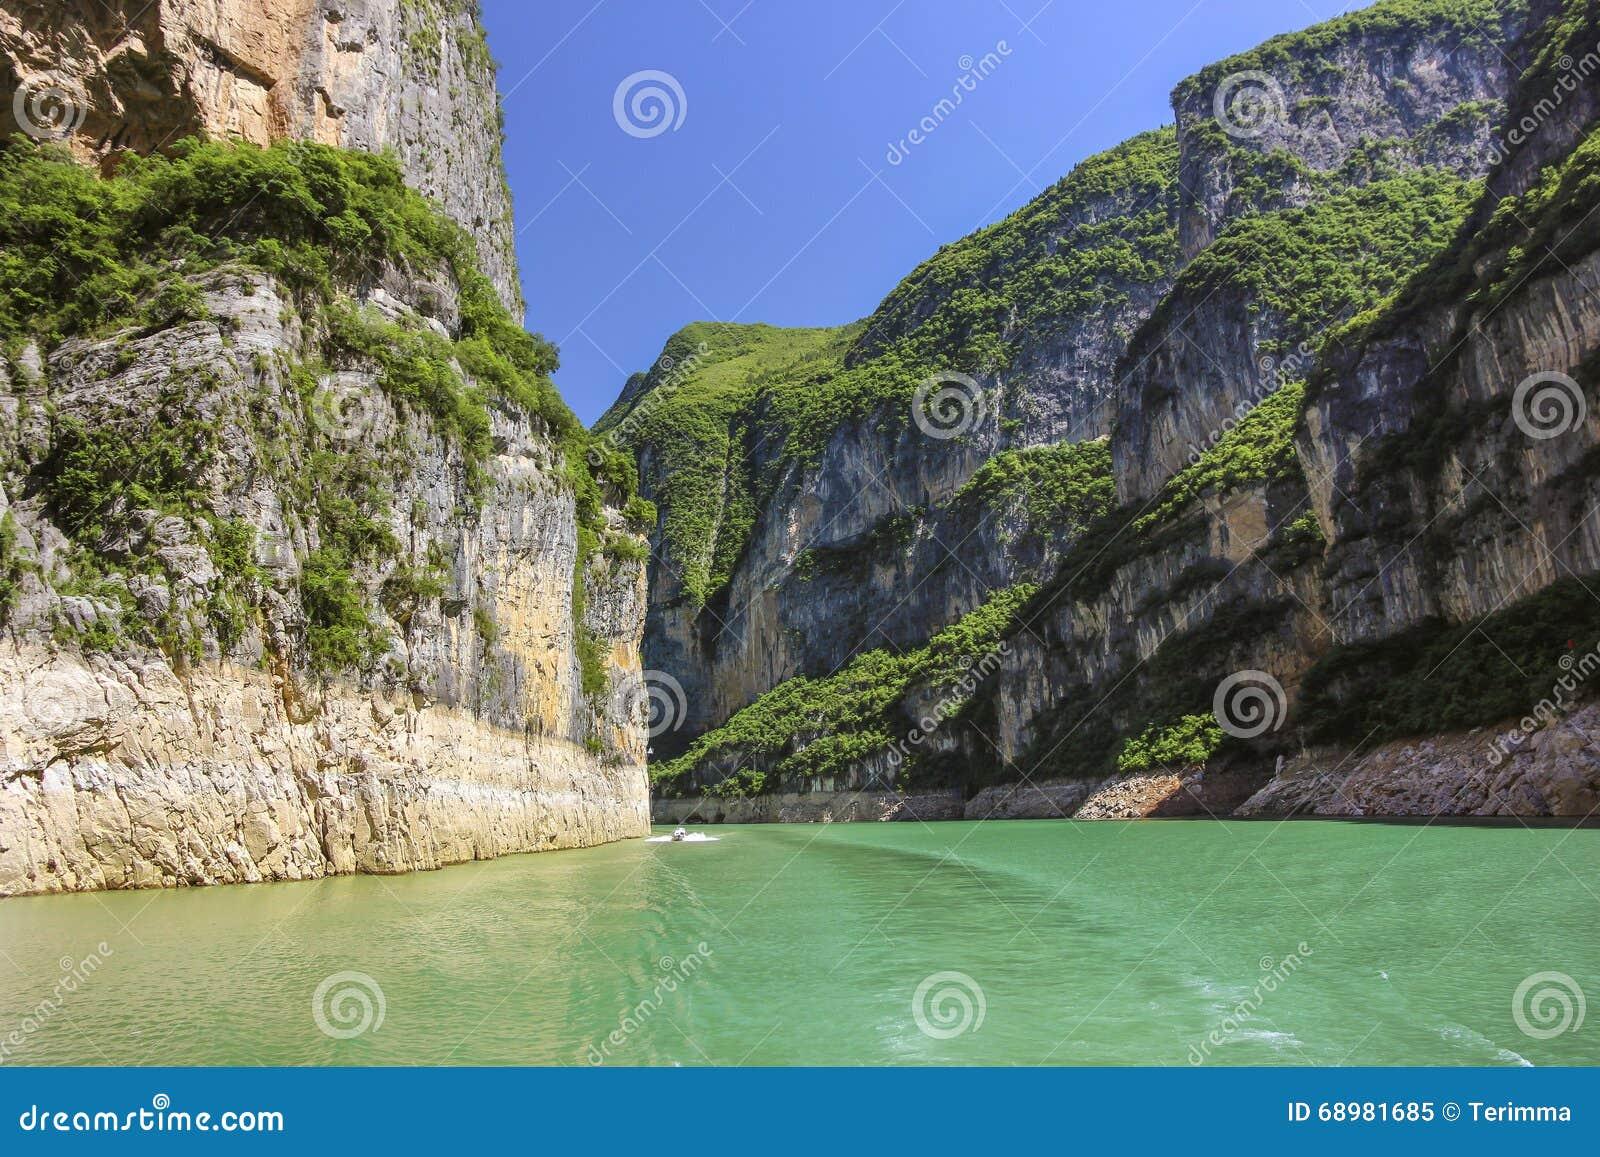 The Gorge on the Yangtze River